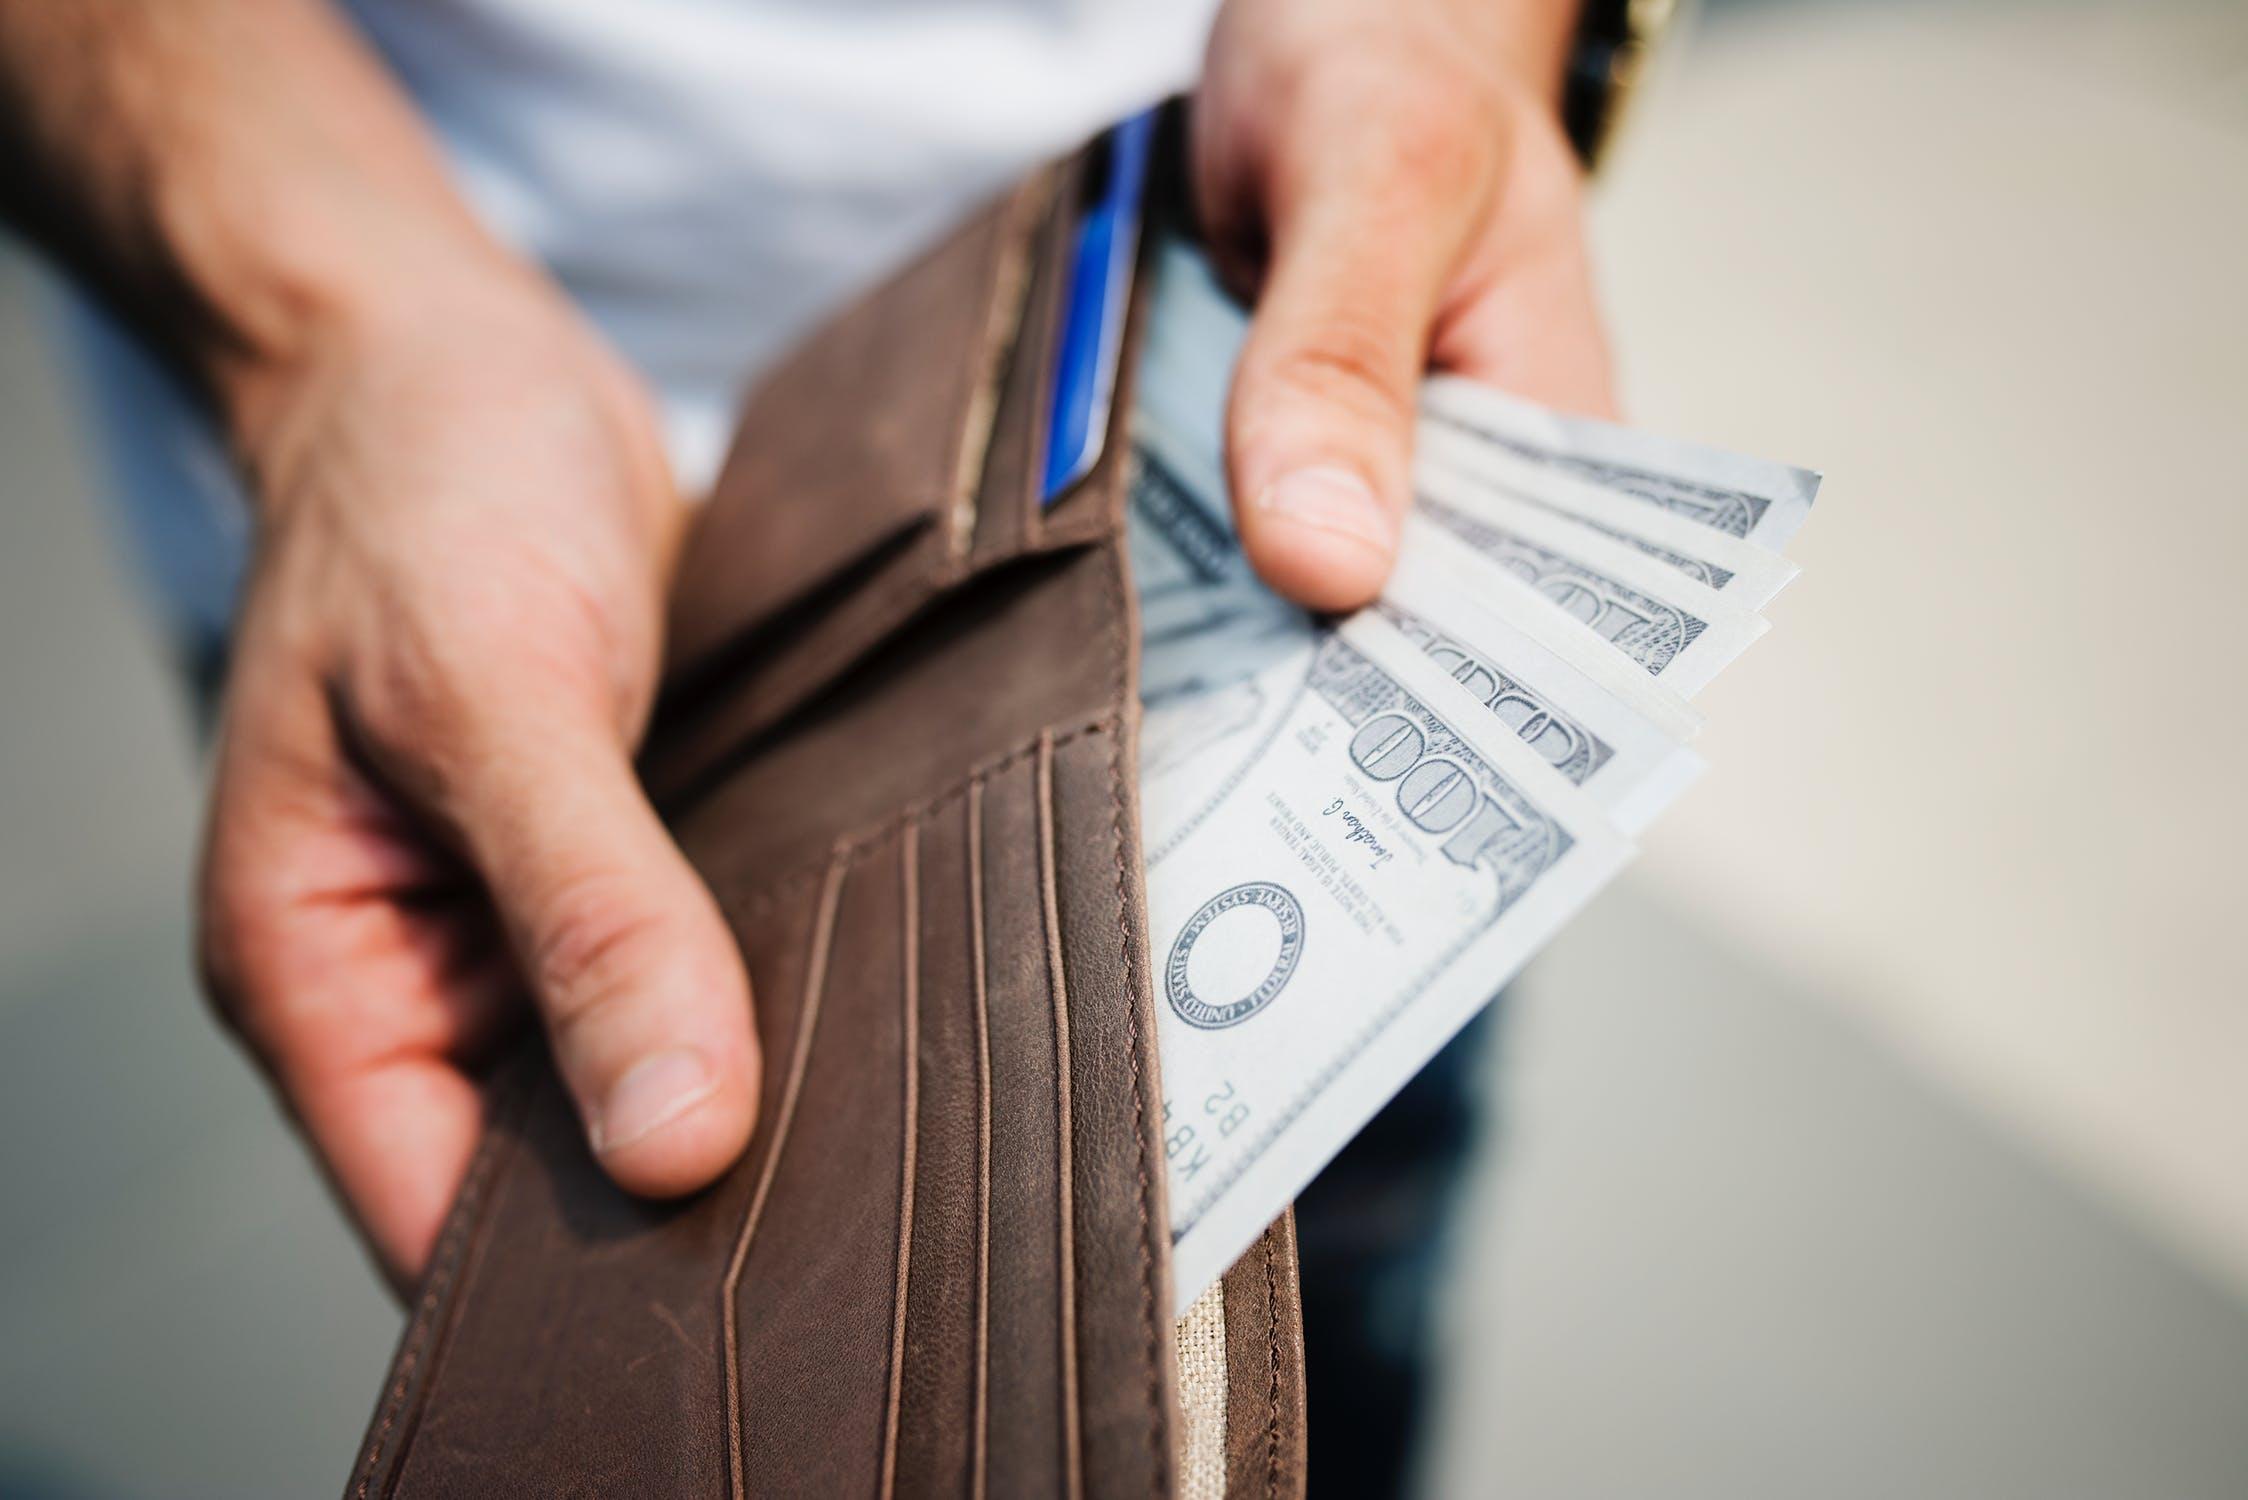 صورة Man Holding Brown Leather Bi-fold Wallet With Money in It